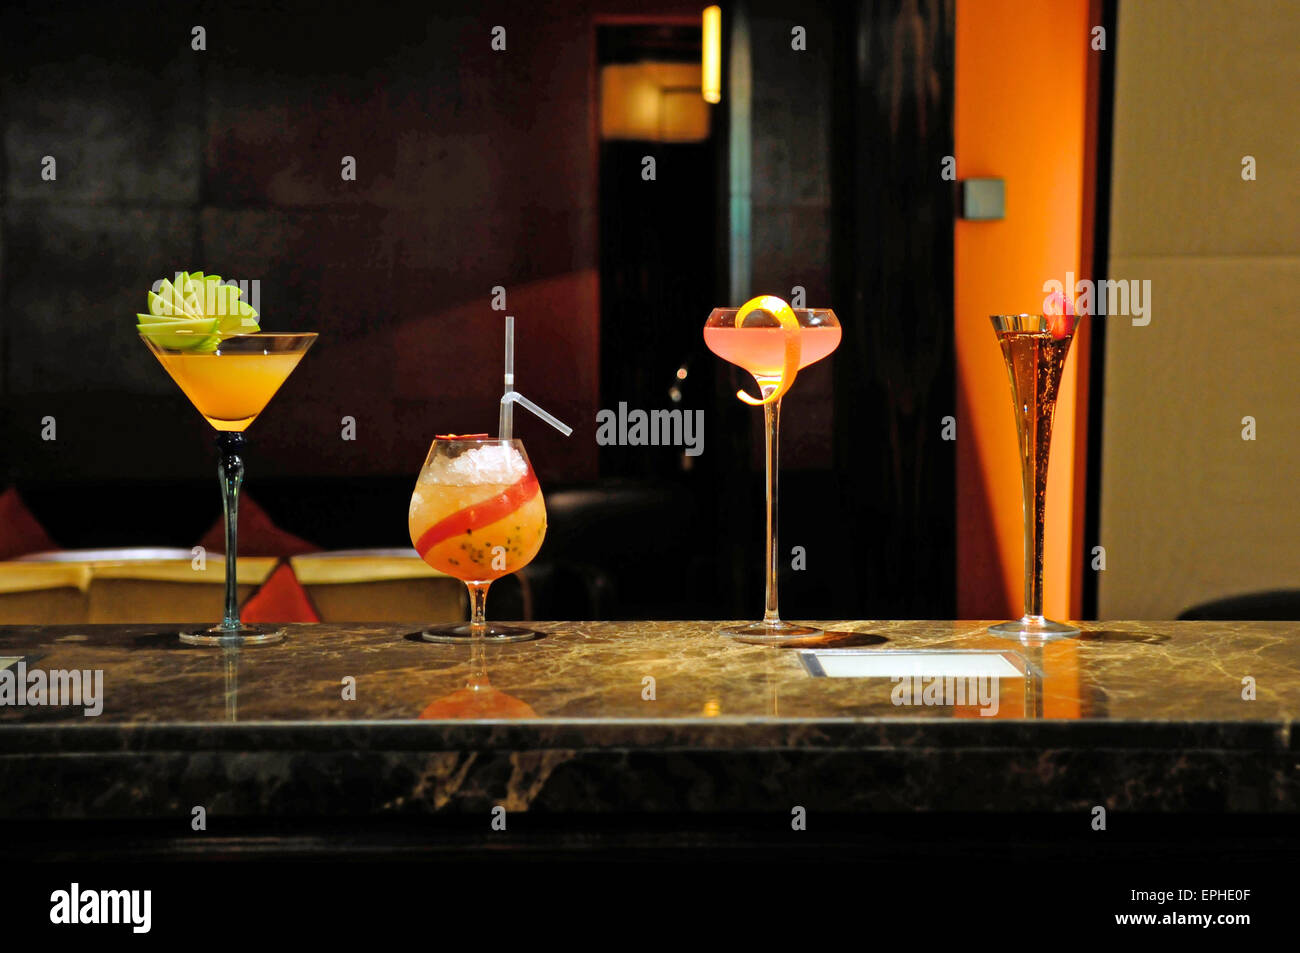 Cocktails on a bar at the Mandarin Oriental Hotel, Knightsbridge, London, England, UK - Stock Image